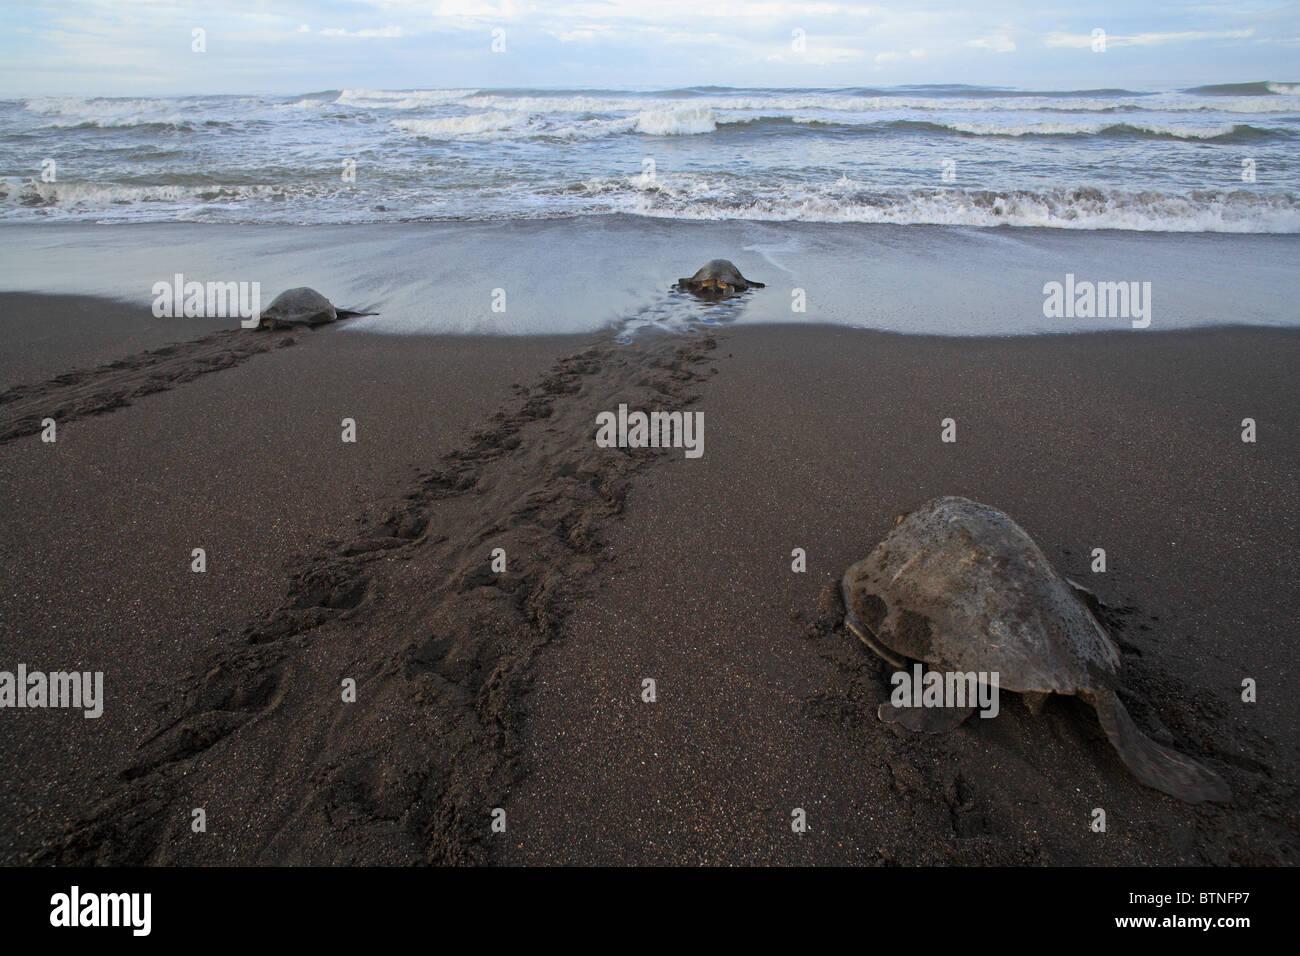 Olive Ridley Turtles (Lepidochelys olivacea) return to sea after nesting during arribada. Playa Ostional, Guanacaste, - Stock Image